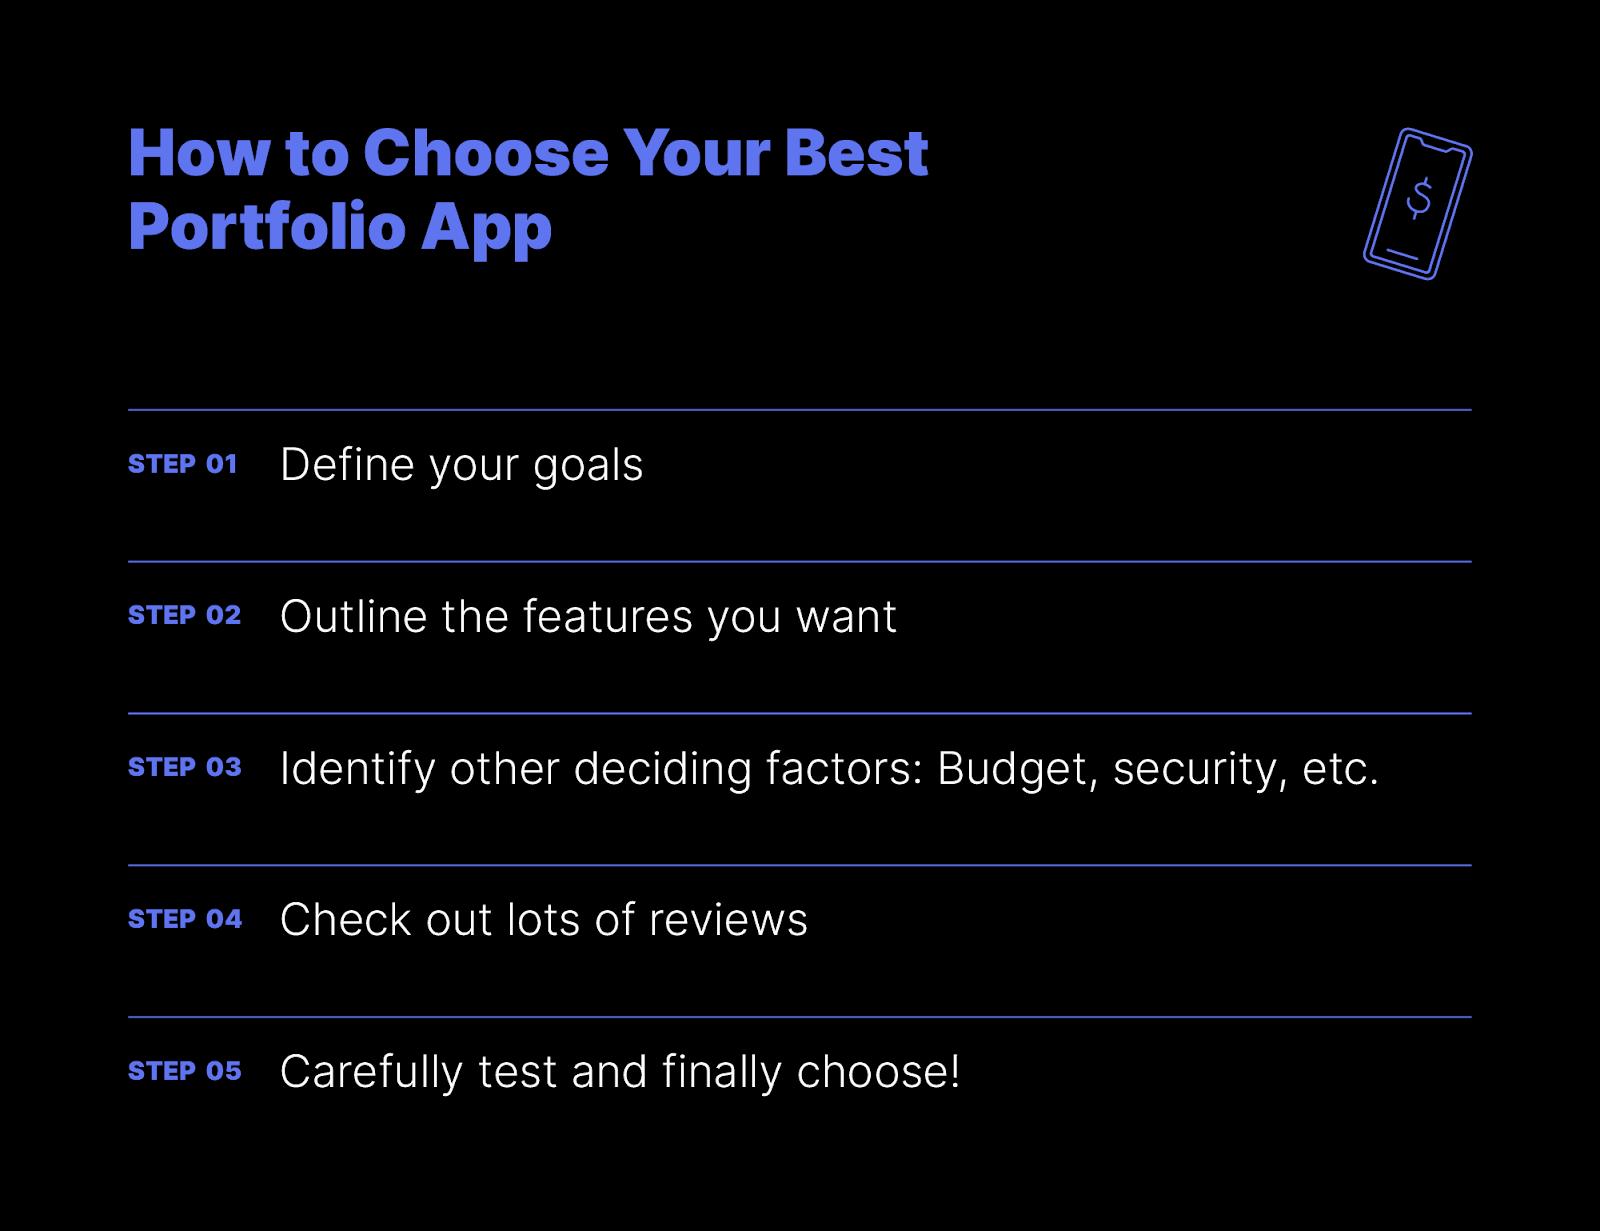 how to choose your best portfolio app